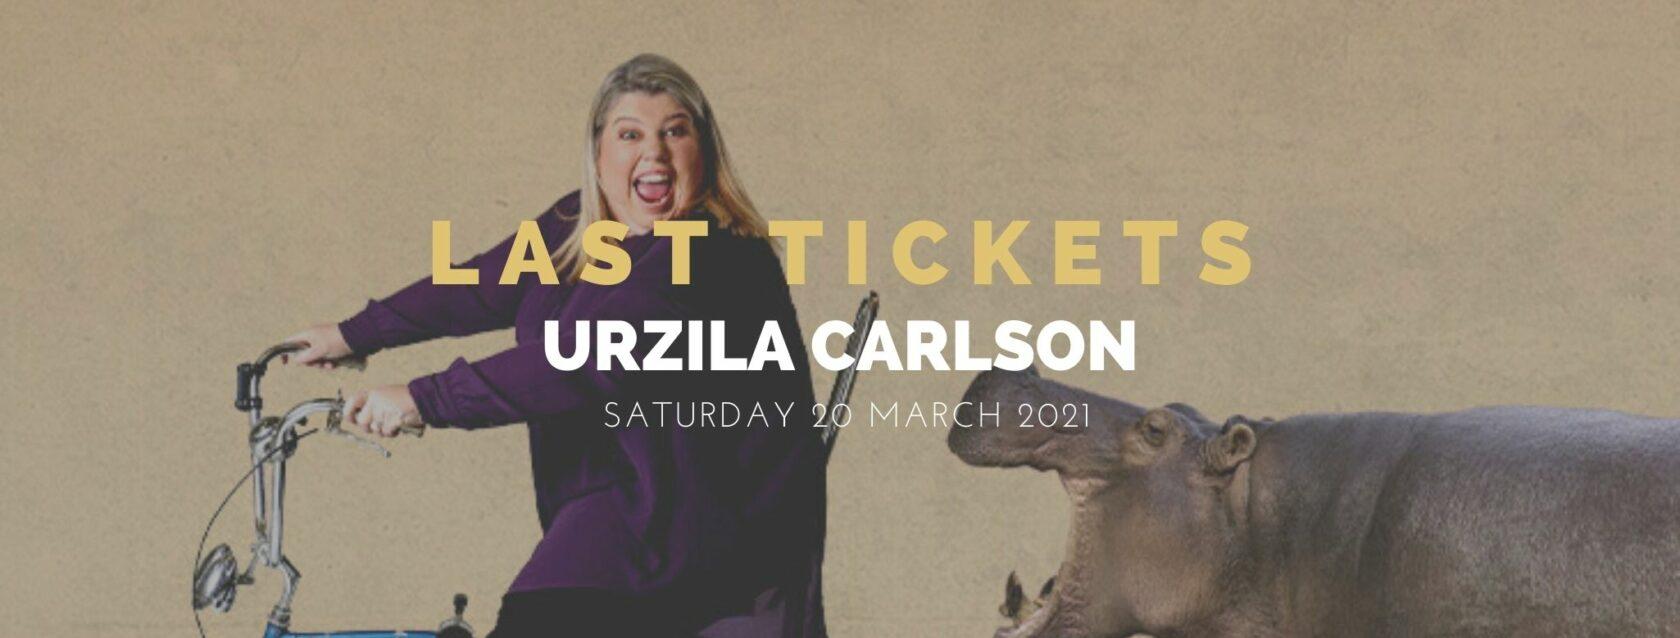 Last Tickets - Urzila Carlson